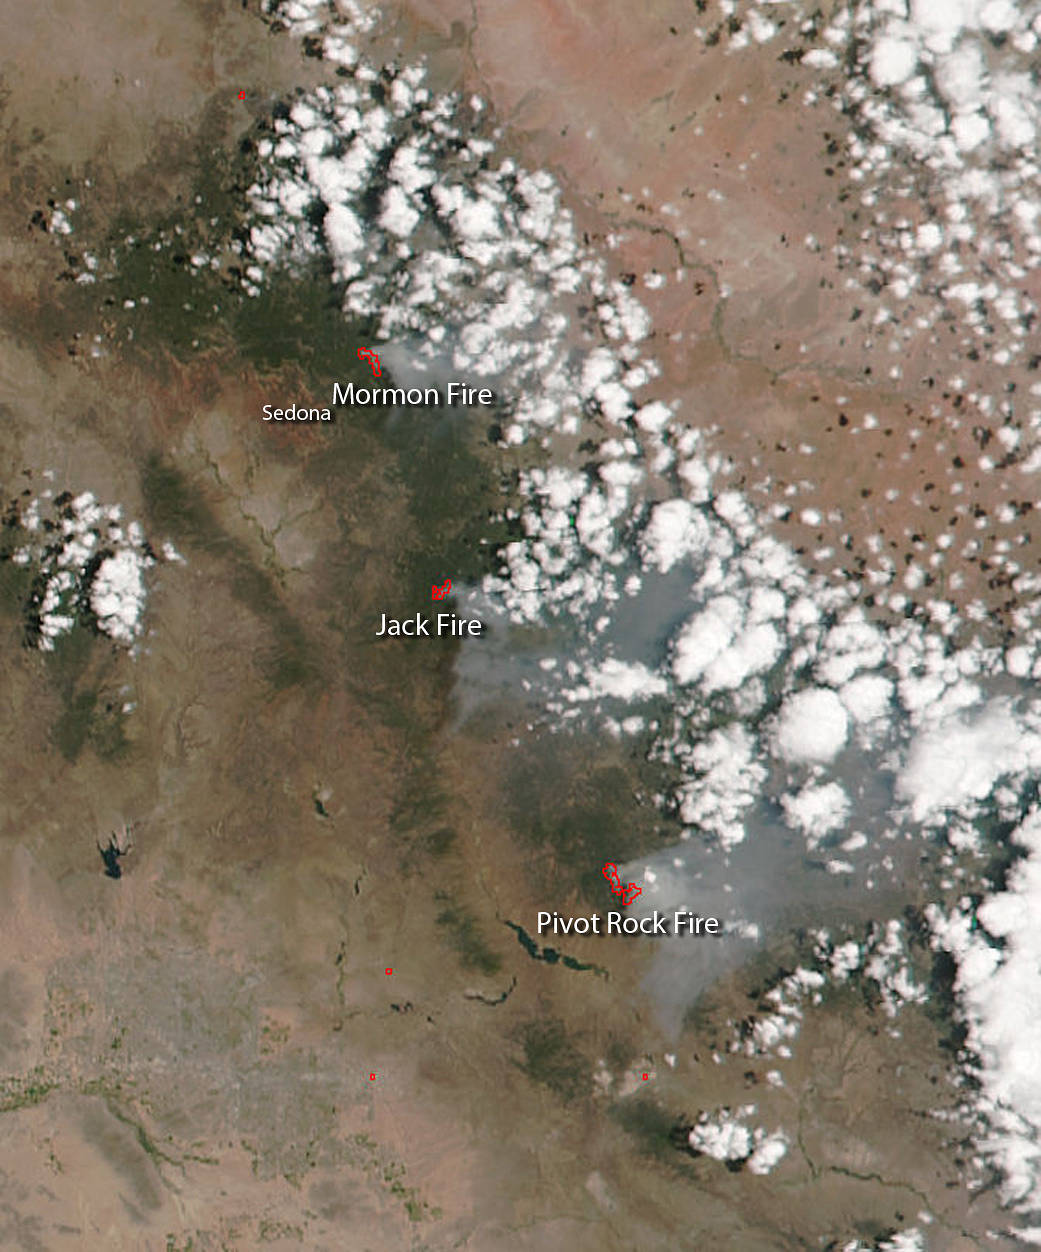 Suomi NPP image of Arizona wildfires